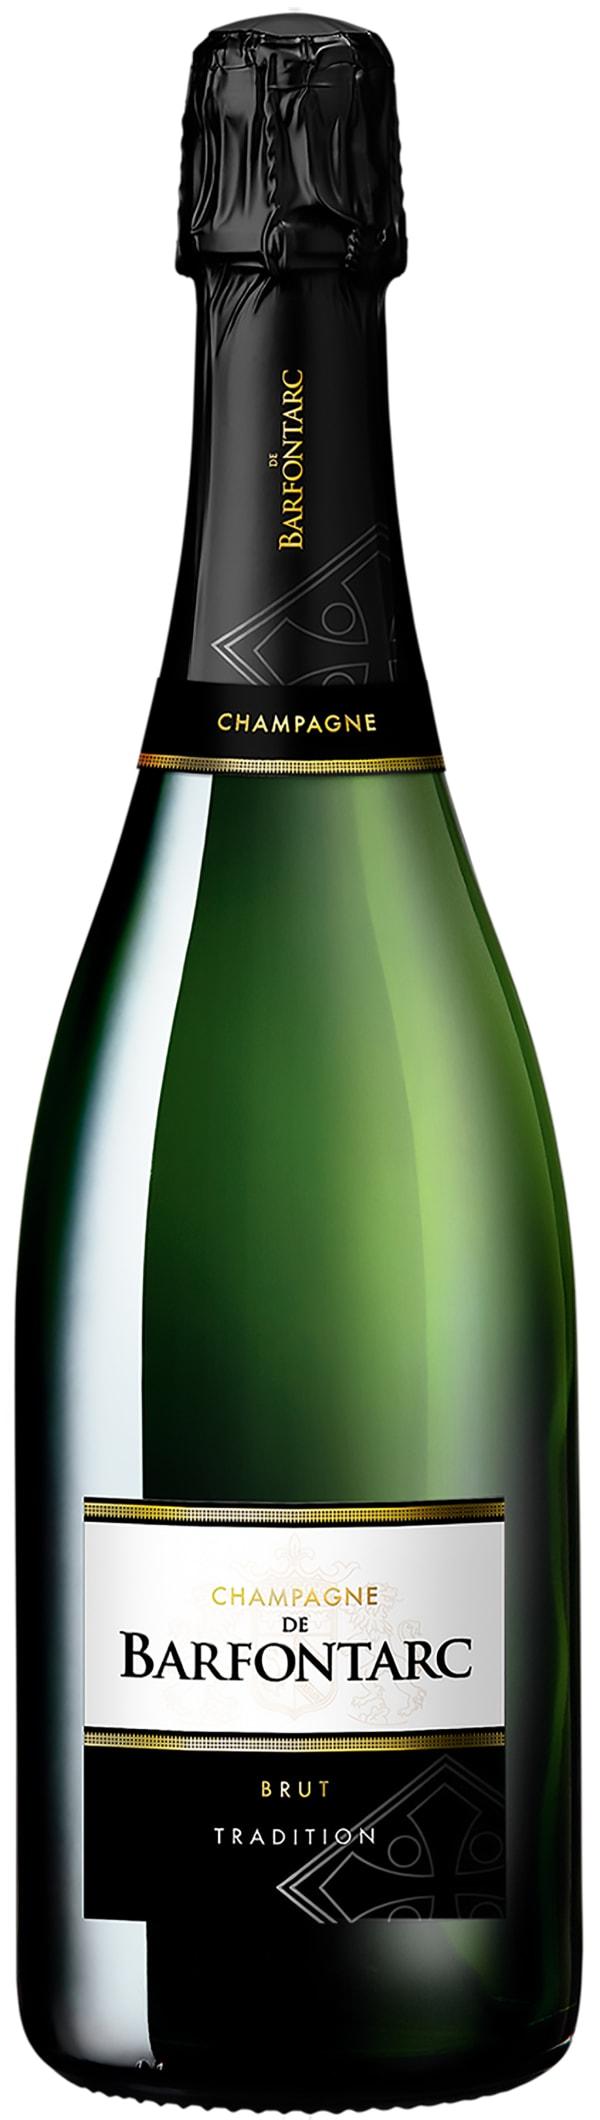 Barfontarc Tradition Champagne Brut